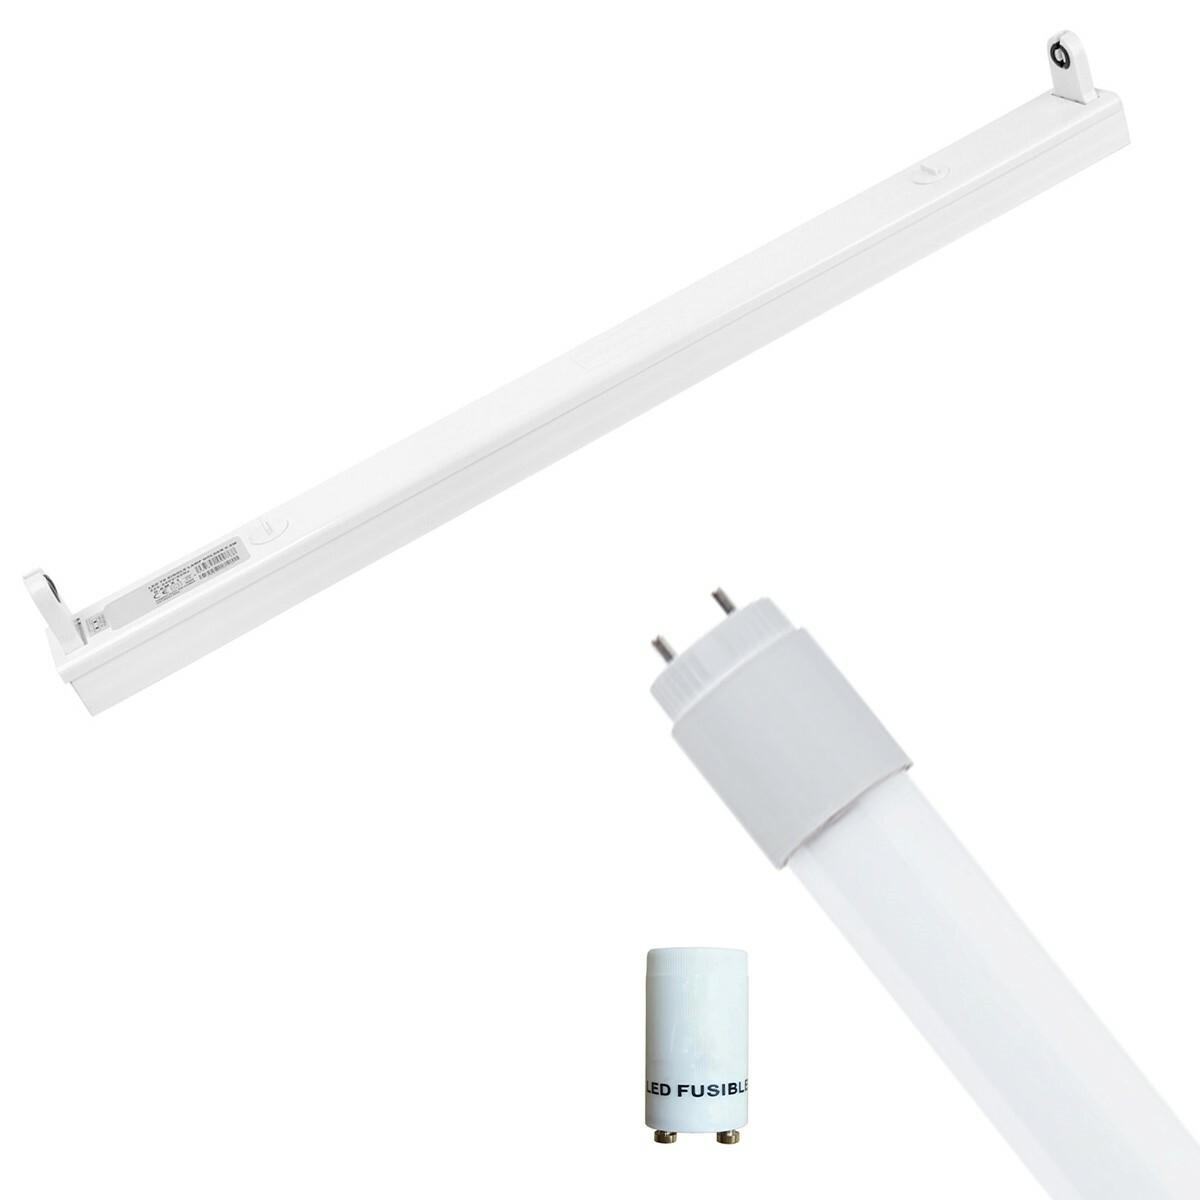 LED TL Armatuur met T8 Buis Incl. Starter - Aigi Dybolo - 60cm Enkel - 8W - Helder/Koud Wit 6400K -